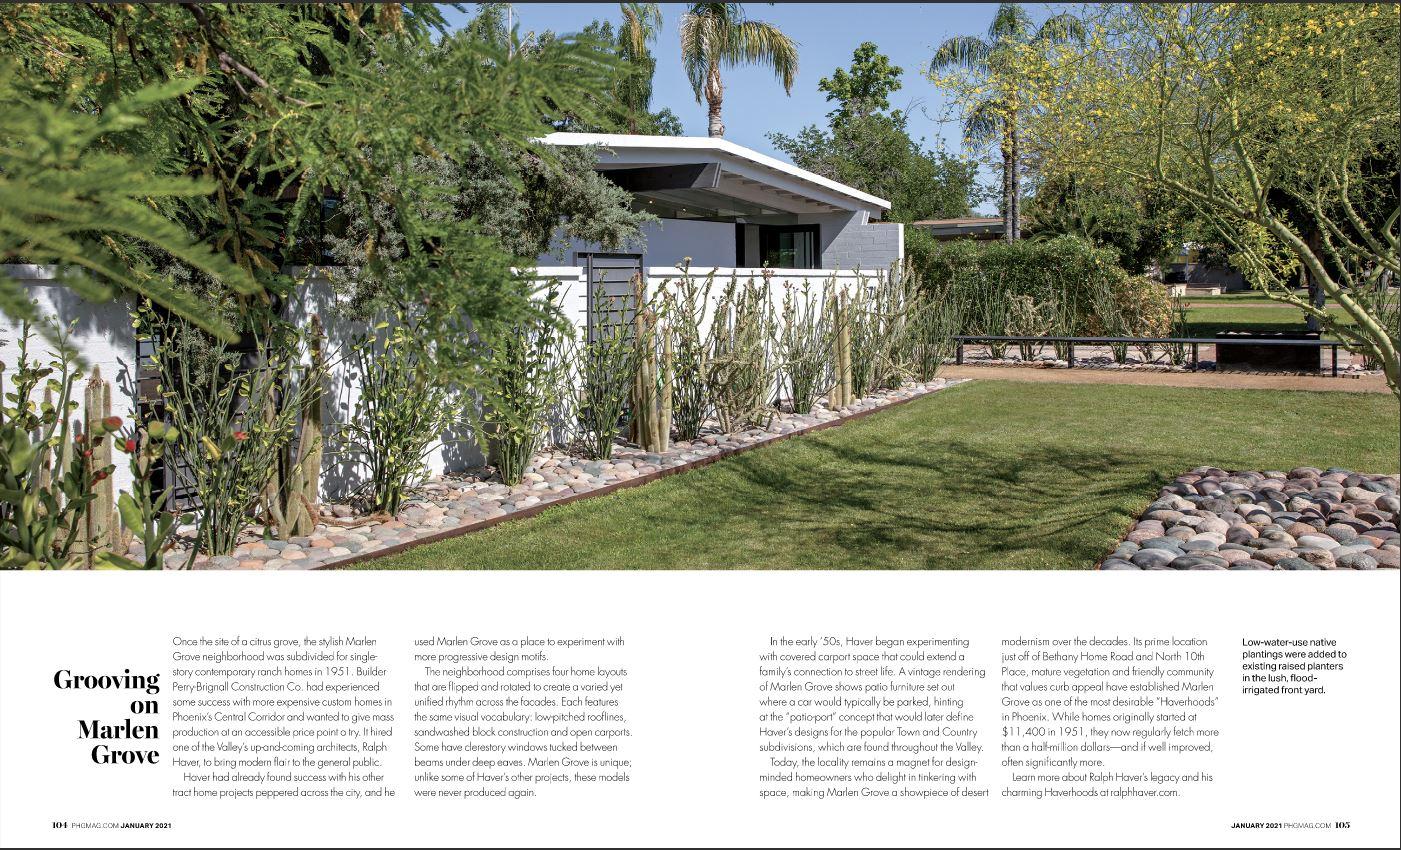 Phoenix Home & Garden: Embracing the New P7